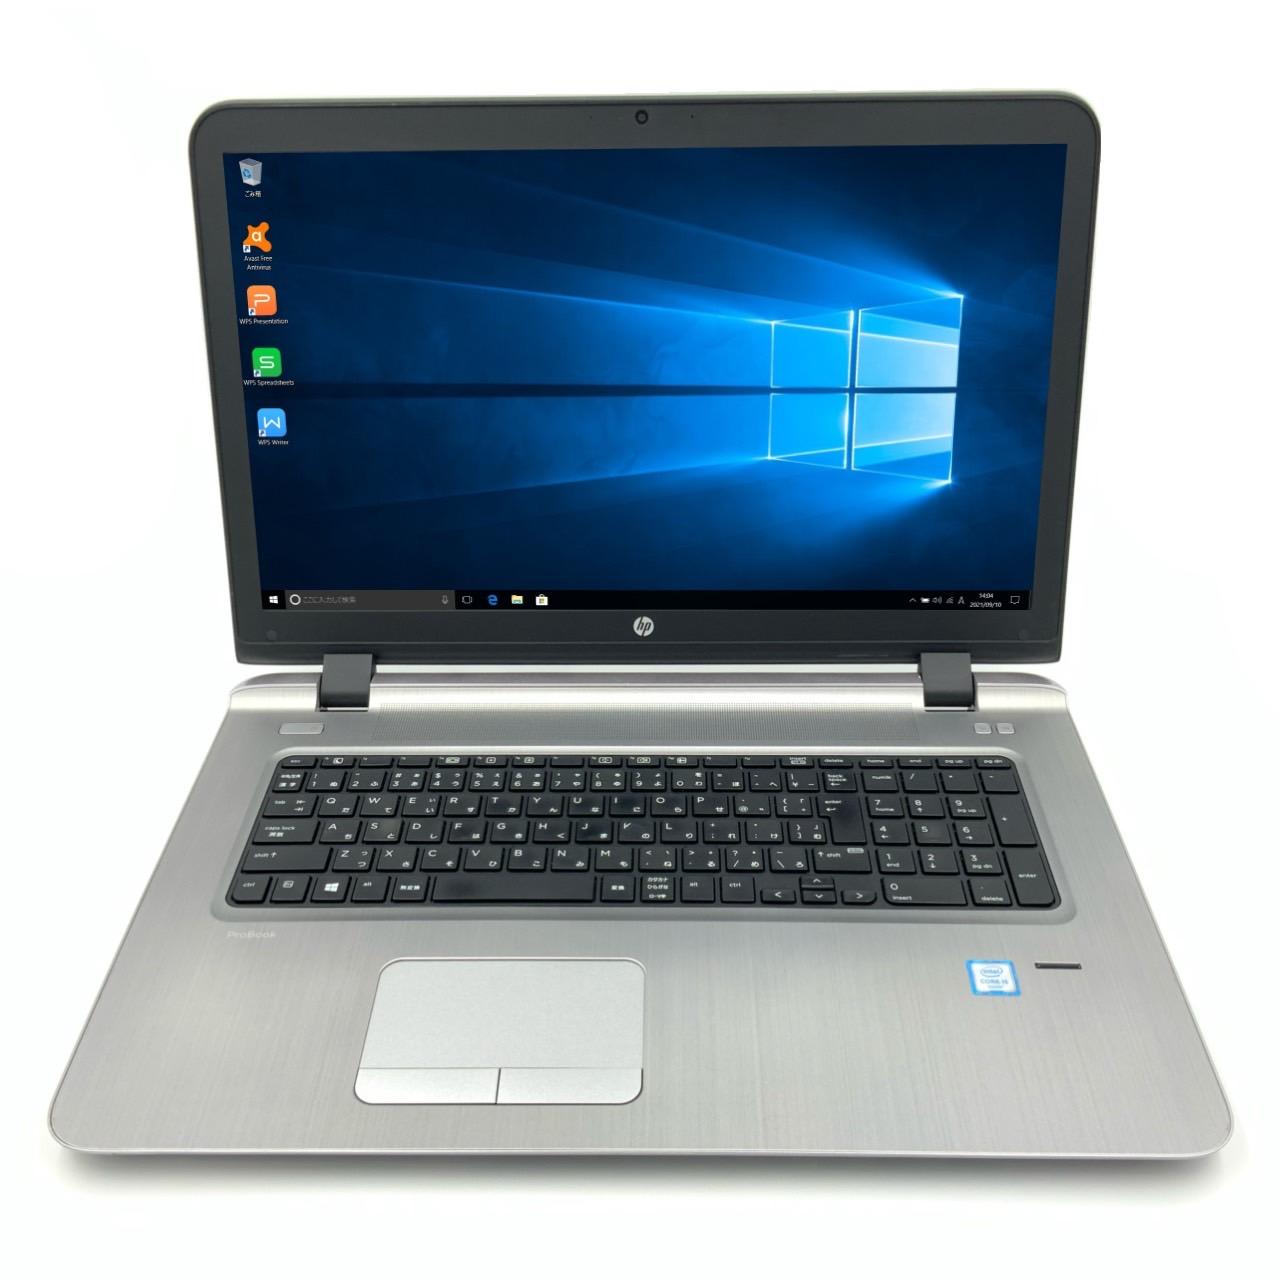 HP ProBook 470 G3 Core 返品不可 i5 4GB 新品SSD4TB 無線LAN Windows10 Notebook ノートパソコン Office 64bit 人気 おすすめ カメラ 中古パソコン WPS 17.3インチ 中古